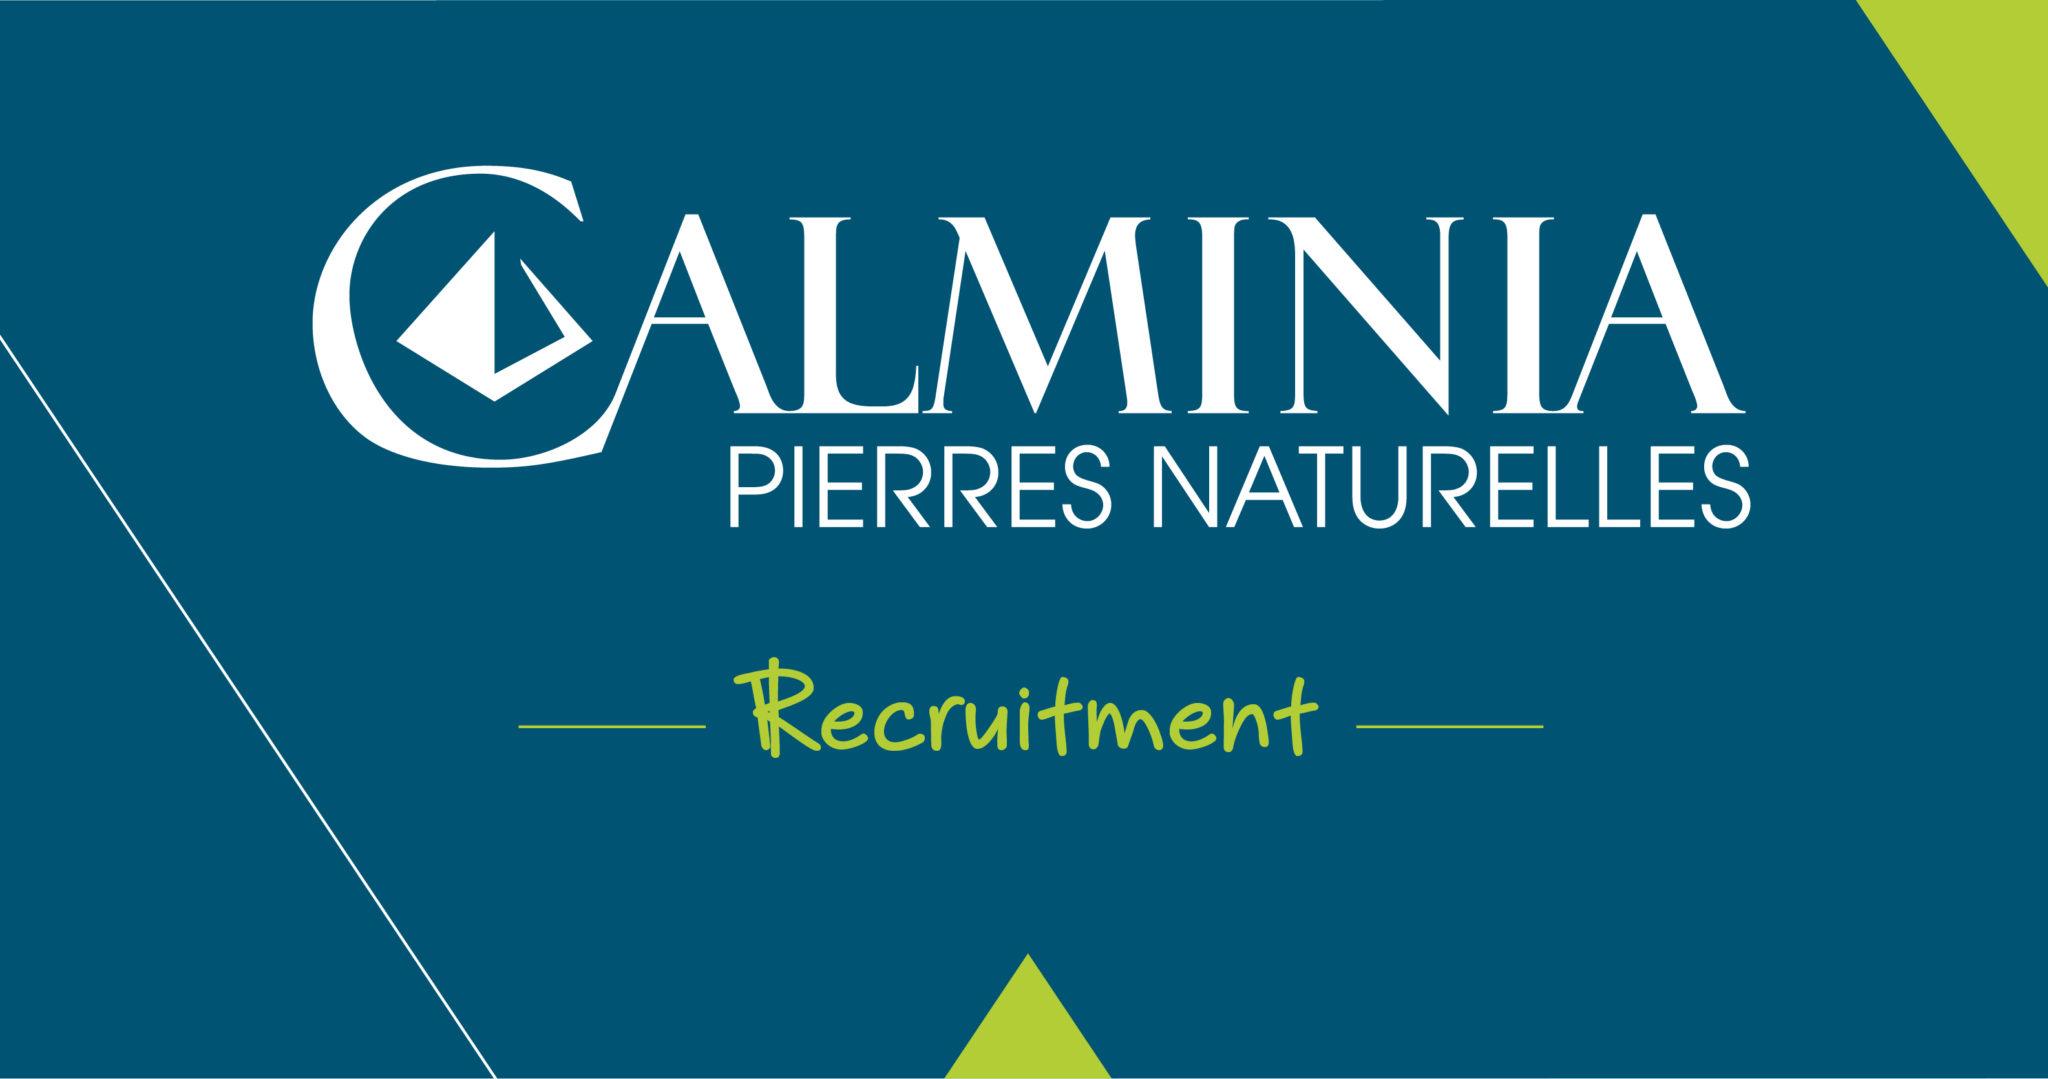 calminia recruitment